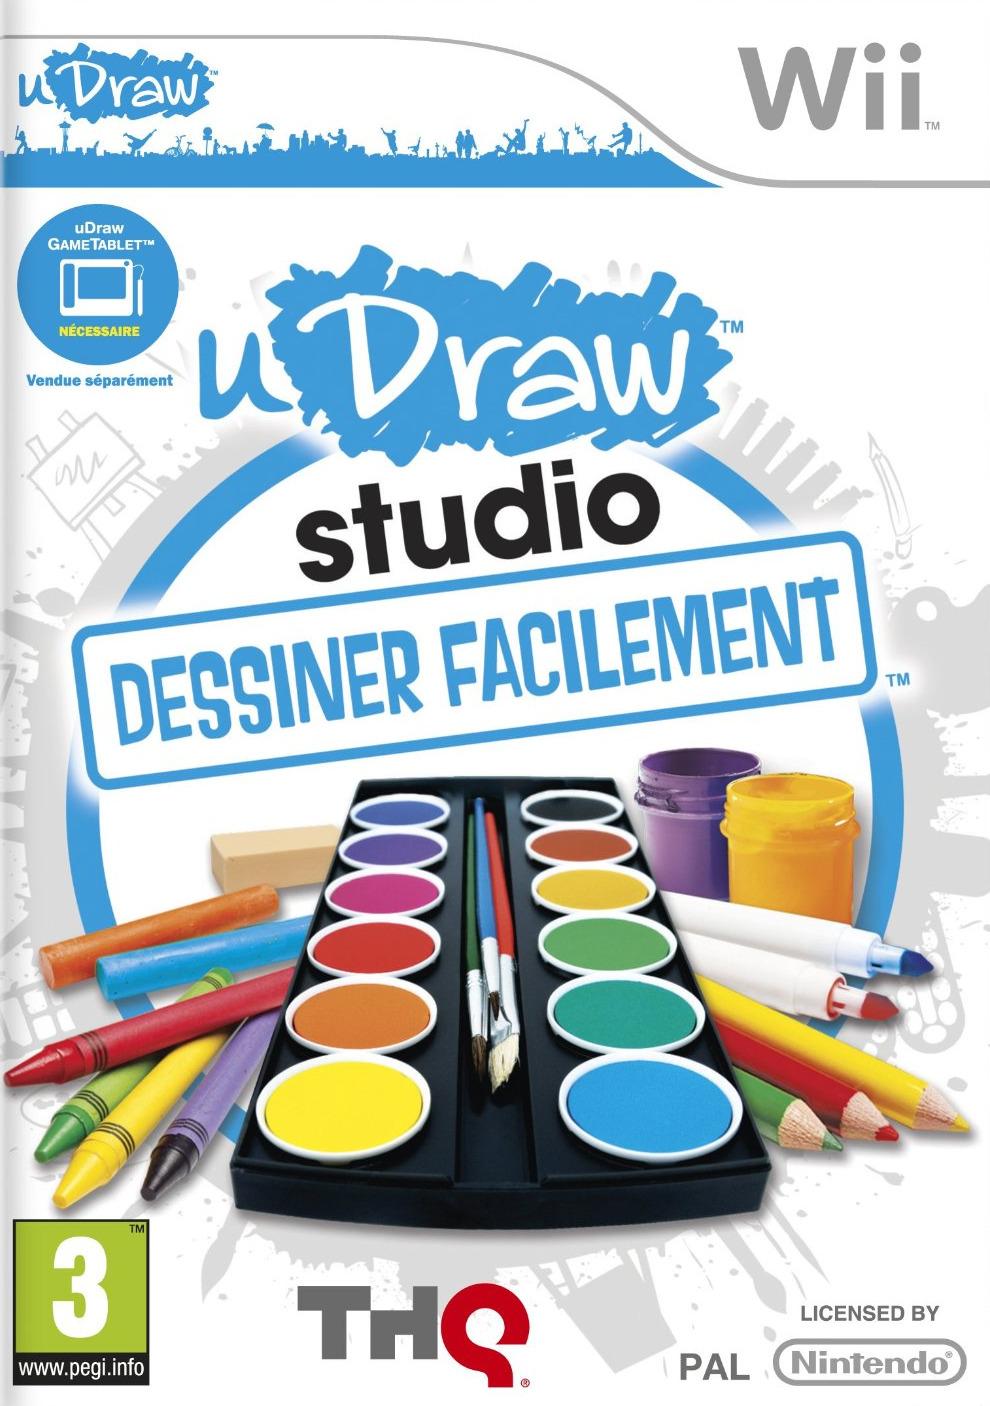 uDrawStudio-DessinerFacilement Wii Jaquette 001